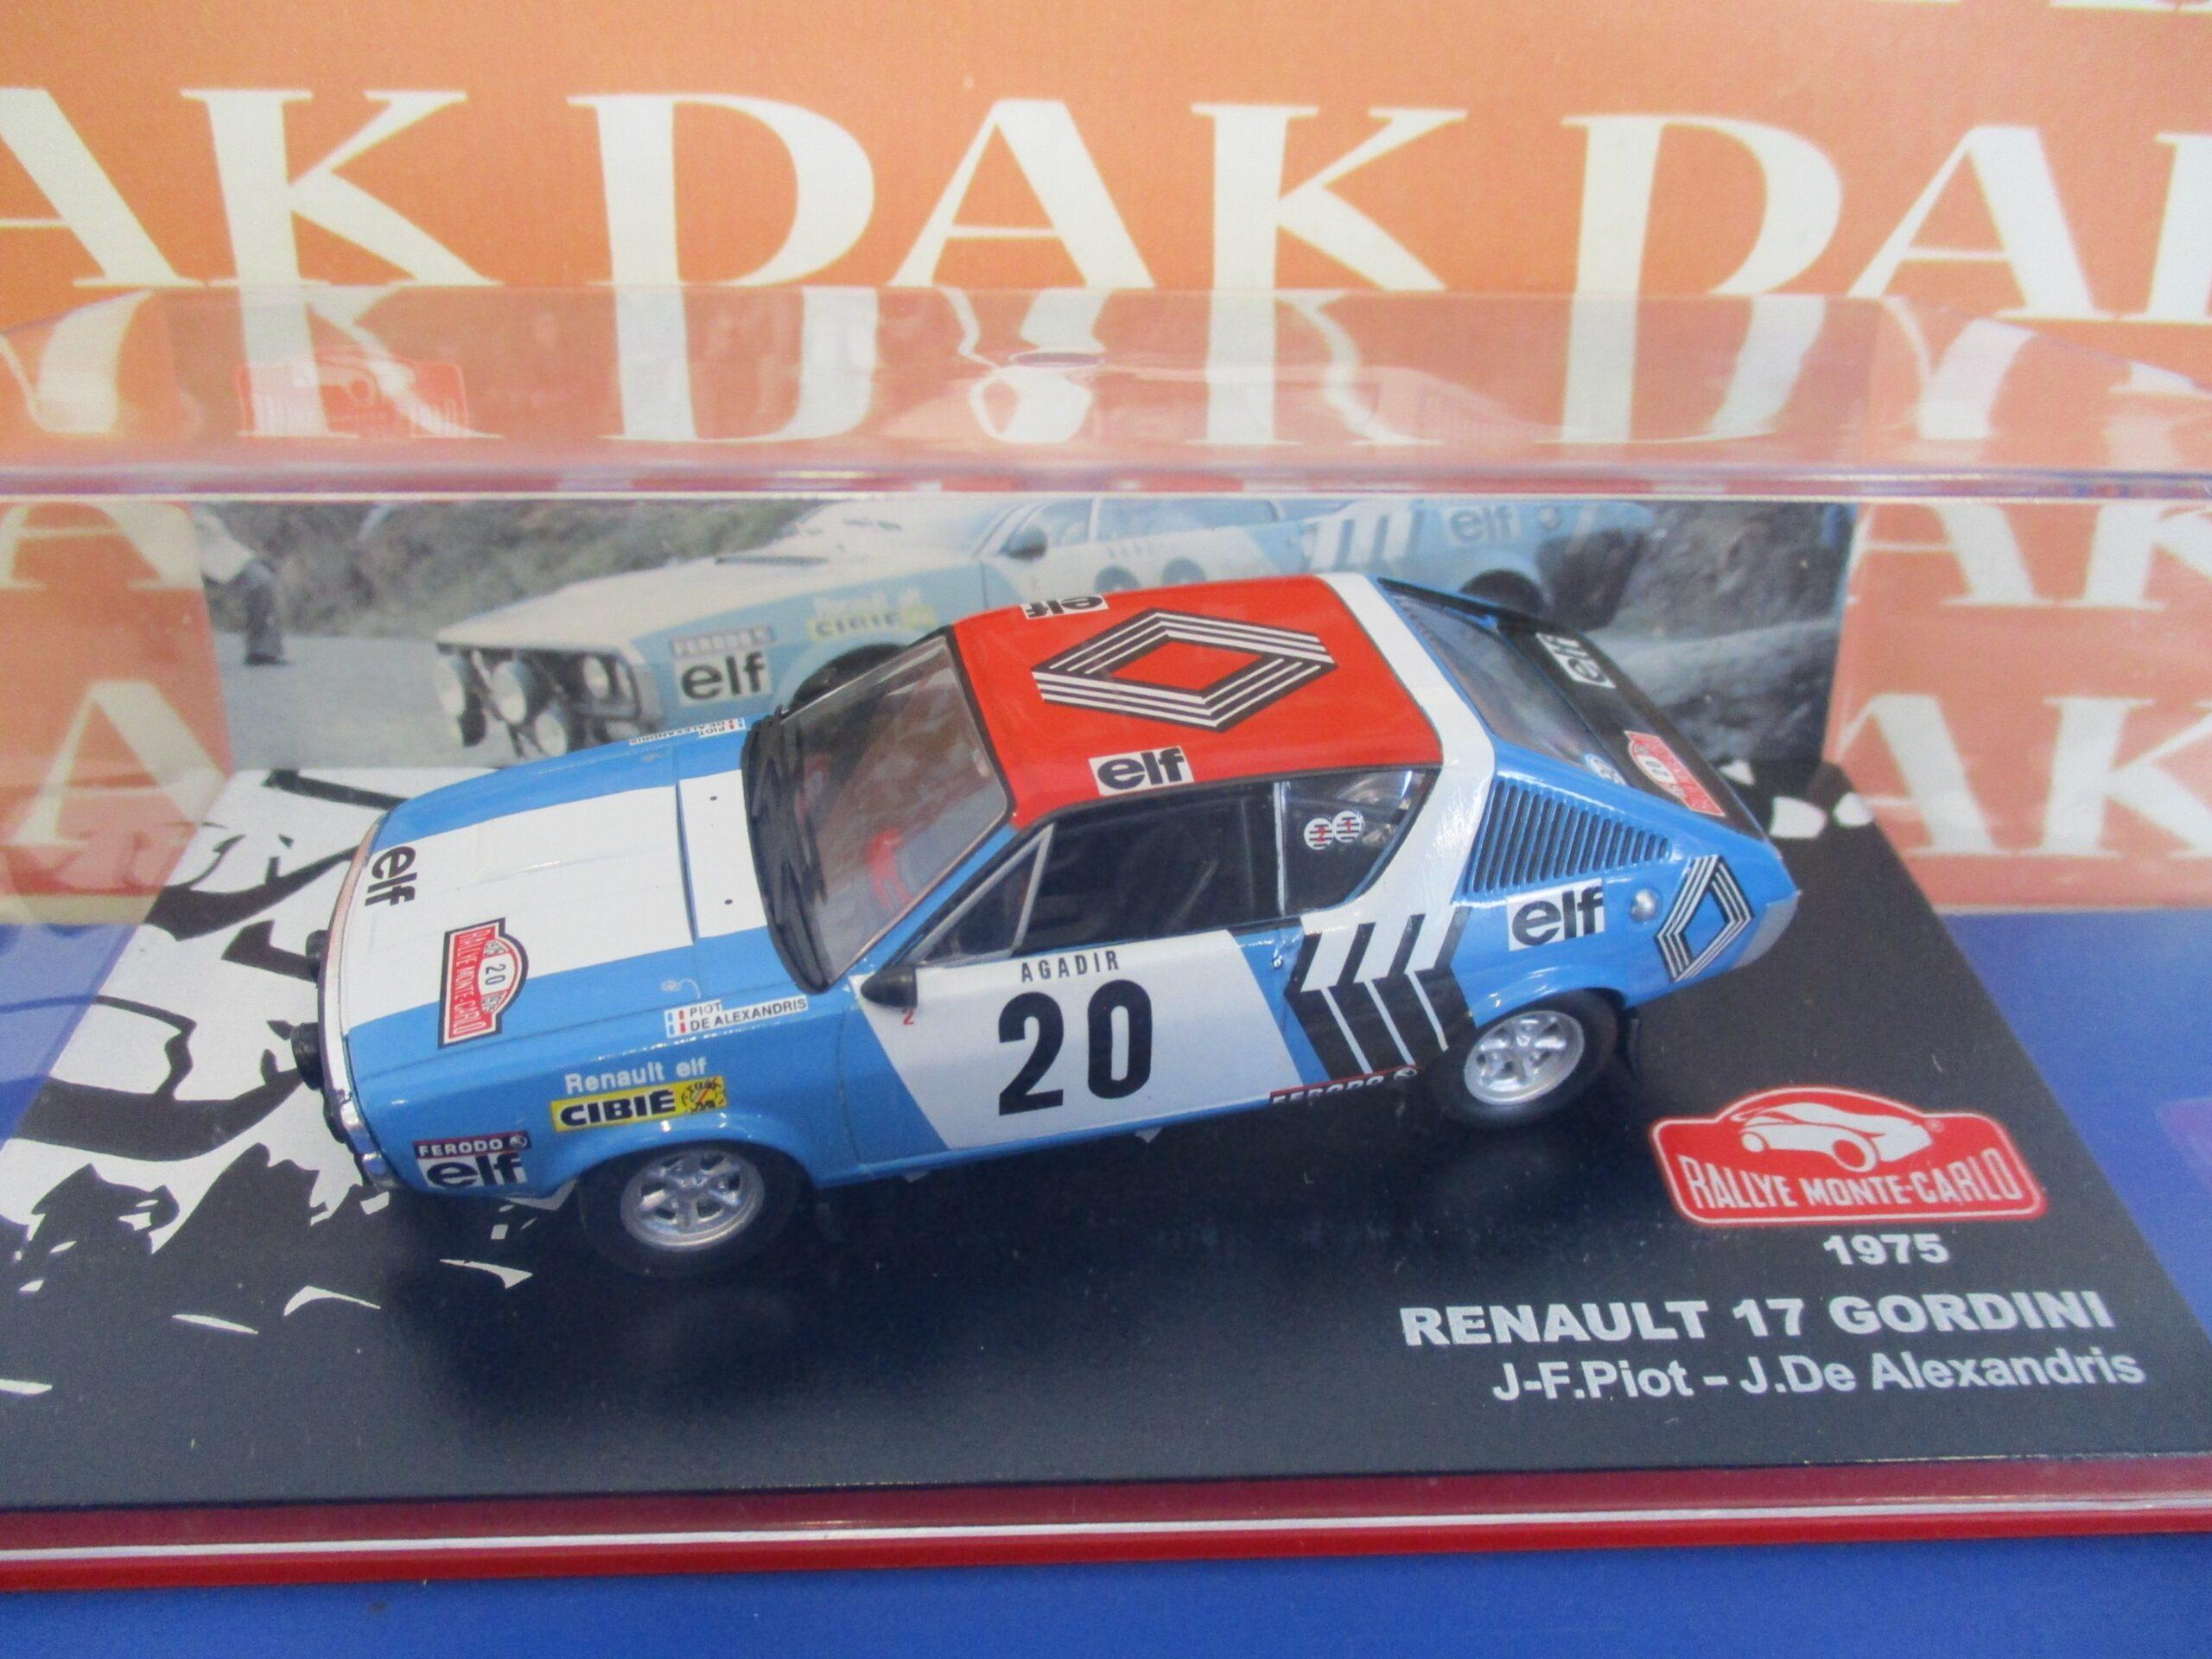 Renault R17 Gordini #20 Rally Montecarlo 1975 Piot EDICOLA 1:43 ED2235025 Miniat